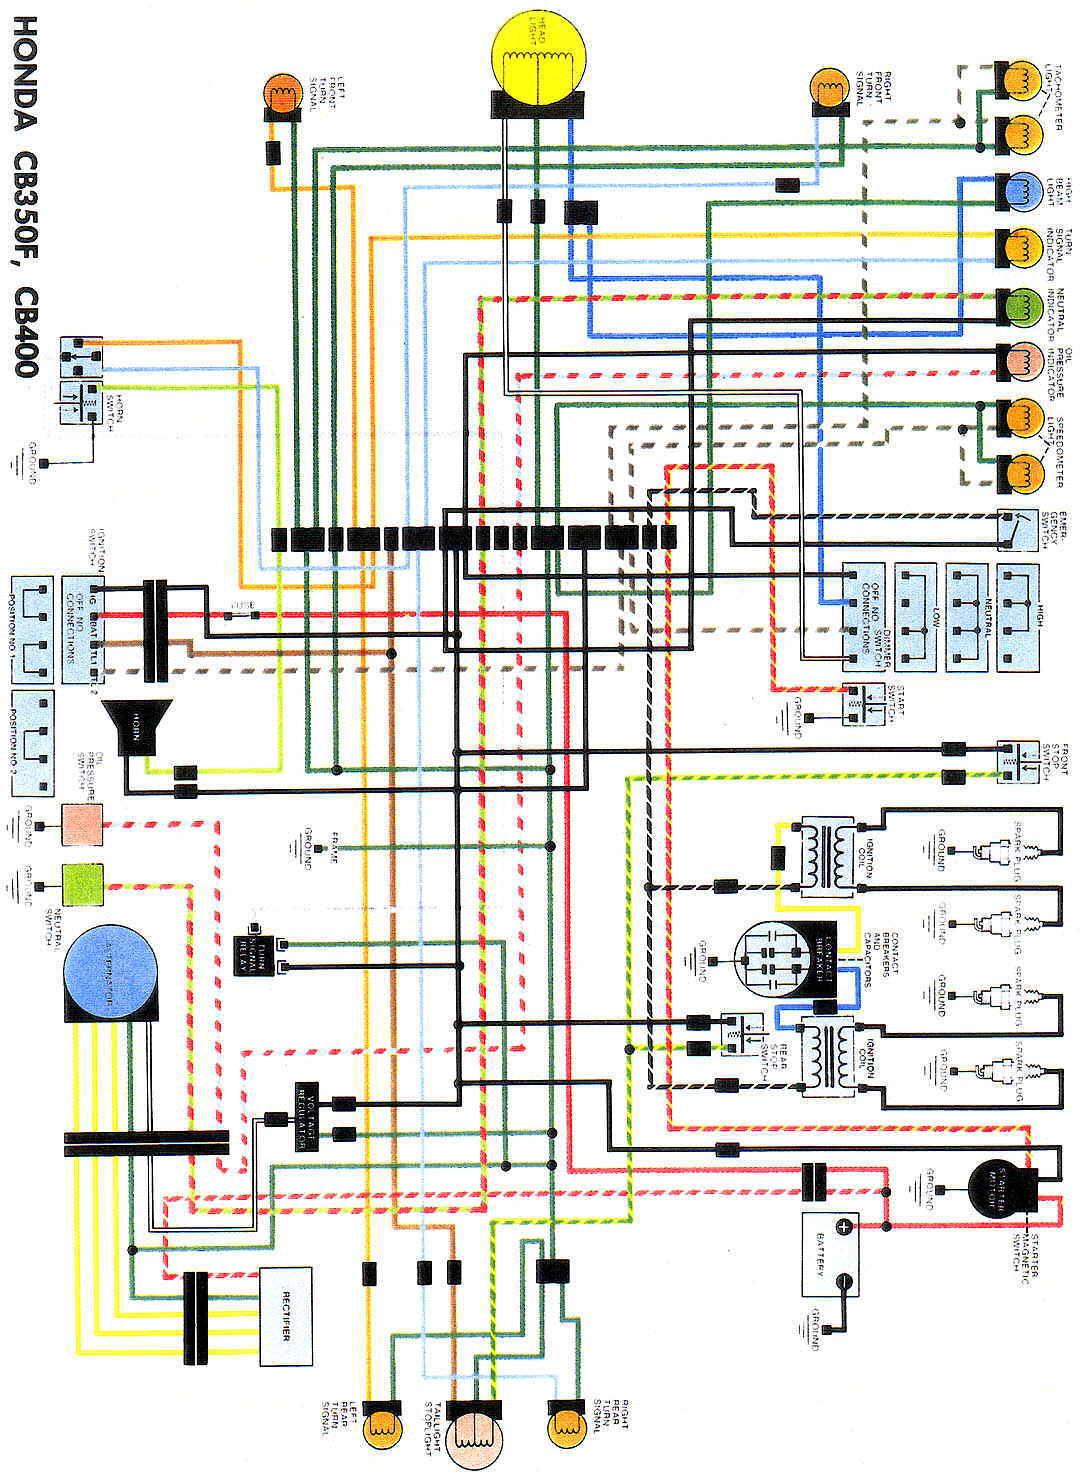 CB350F_CB400WiringDiag?resize=665%2C910 suzuki bandit wiring diagram the best wiring diagram 2017 Basic Electrical Wiring Diagrams at reclaimingppi.co